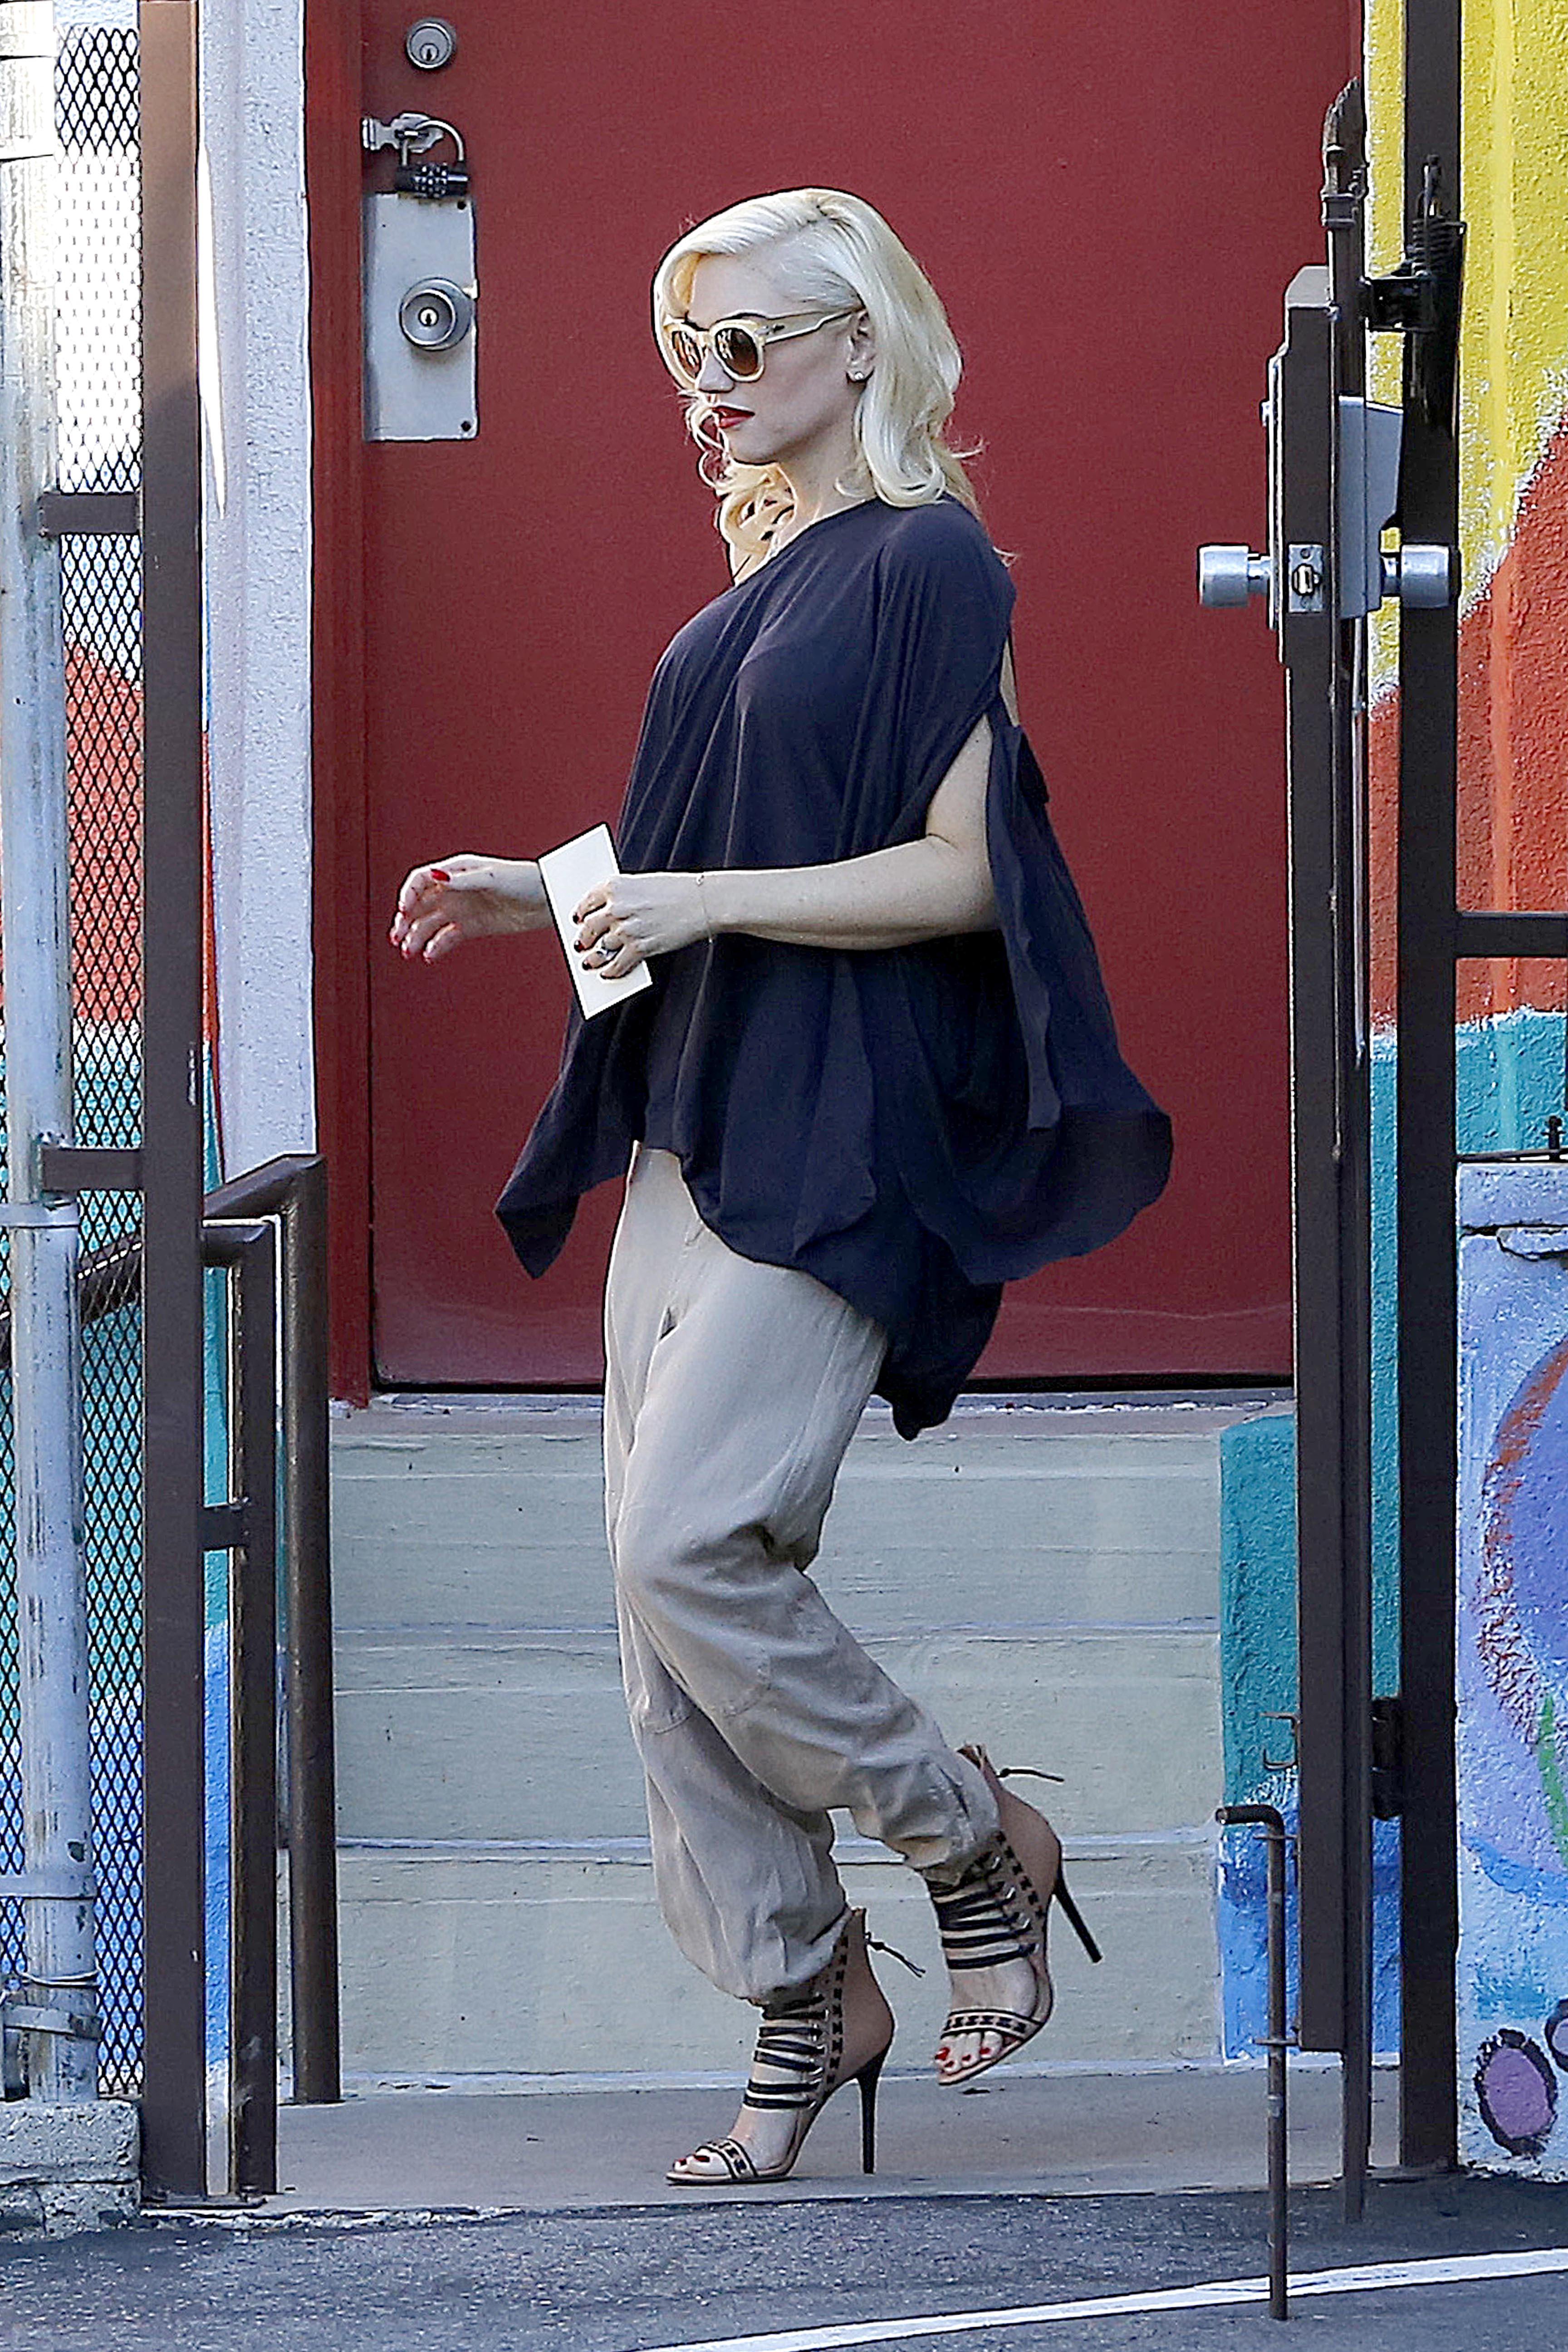 Gwen Stefani possibly pregnant